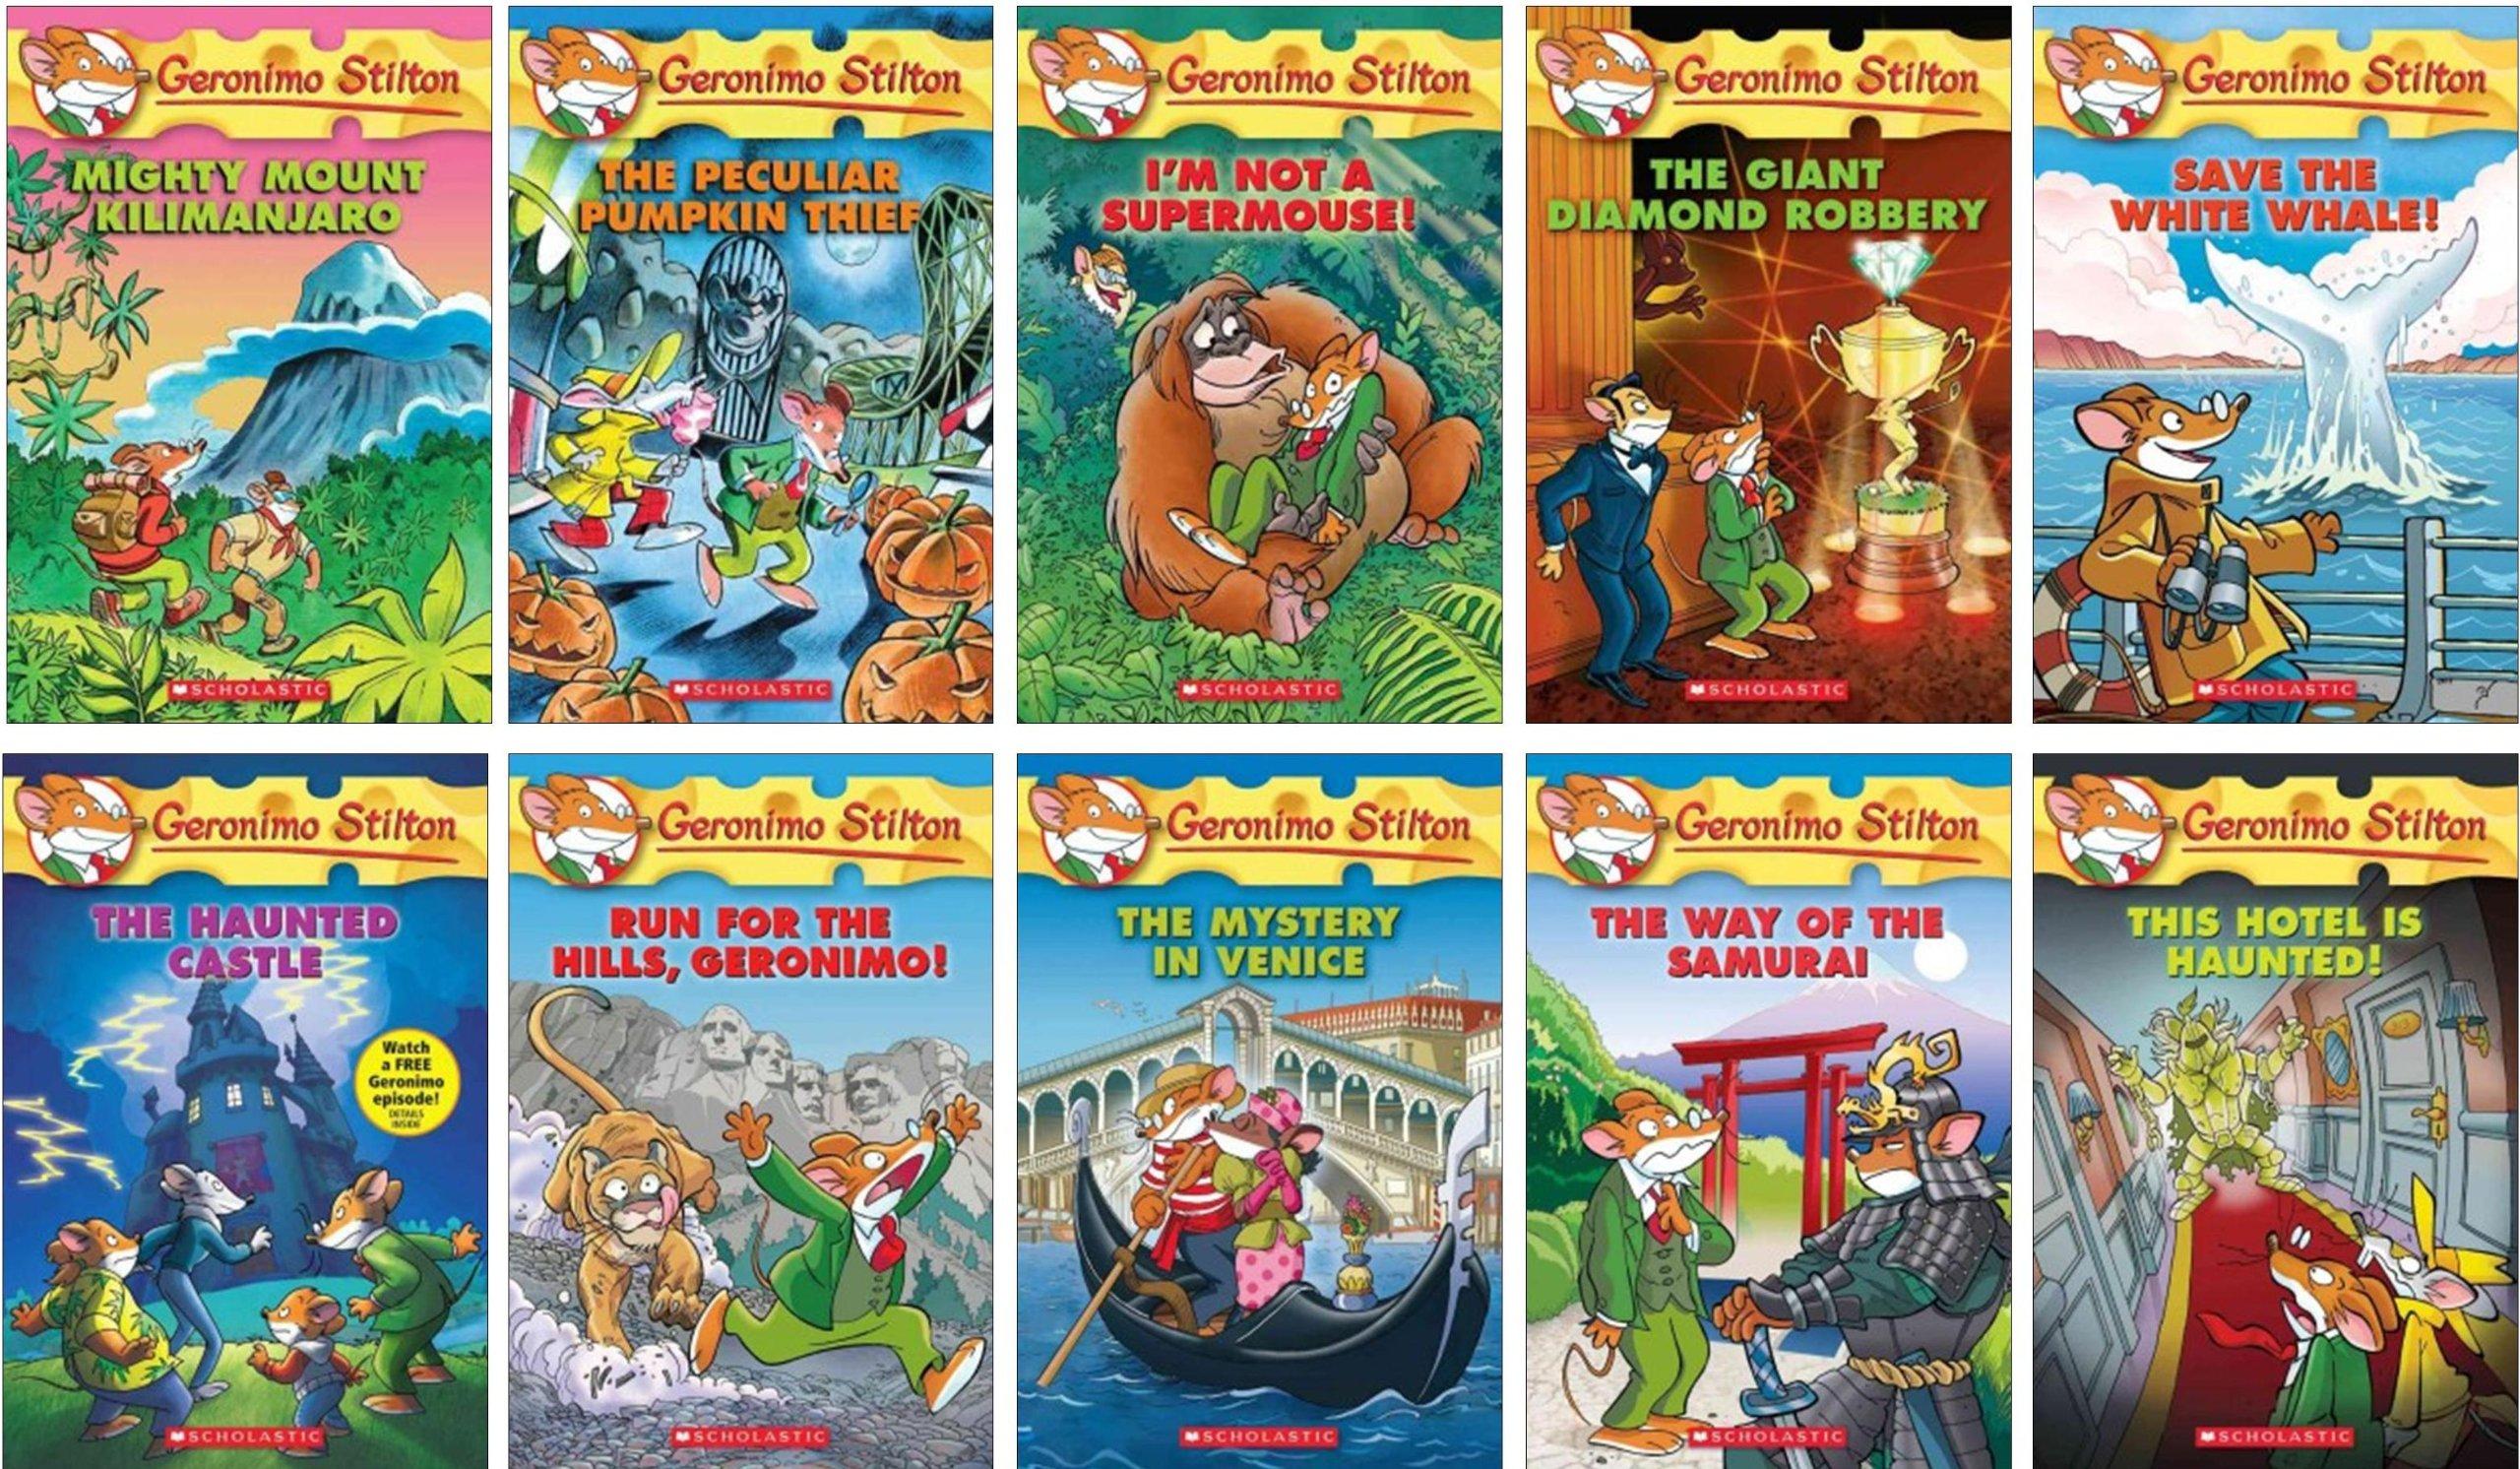 Geronimo Stilton Series (41-60) Discounted!Discounted!